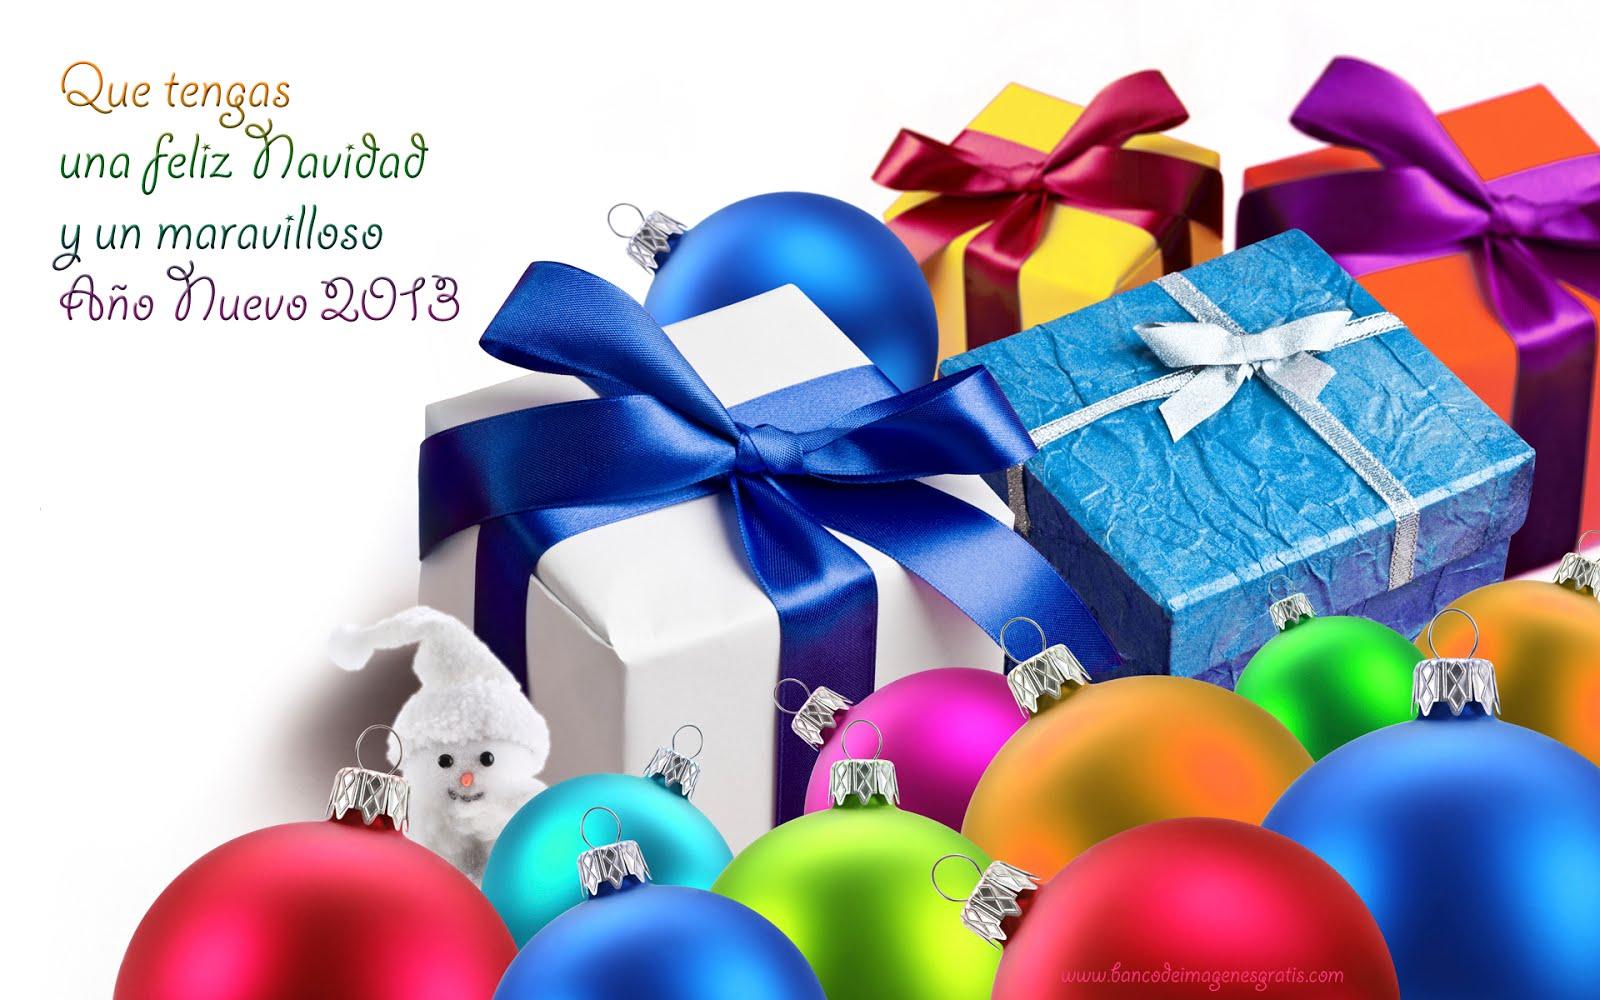 http://2.bp.blogspot.com/-ytfiBHFI48o/UKcT3BC0tXI/AAAAAAABQt4/GCWI_OgiSvg/s1600/fondos-y-wallpapers-para-navidad-y-a%25C3%25B1o-nuevo-2013-mensajes.jpg